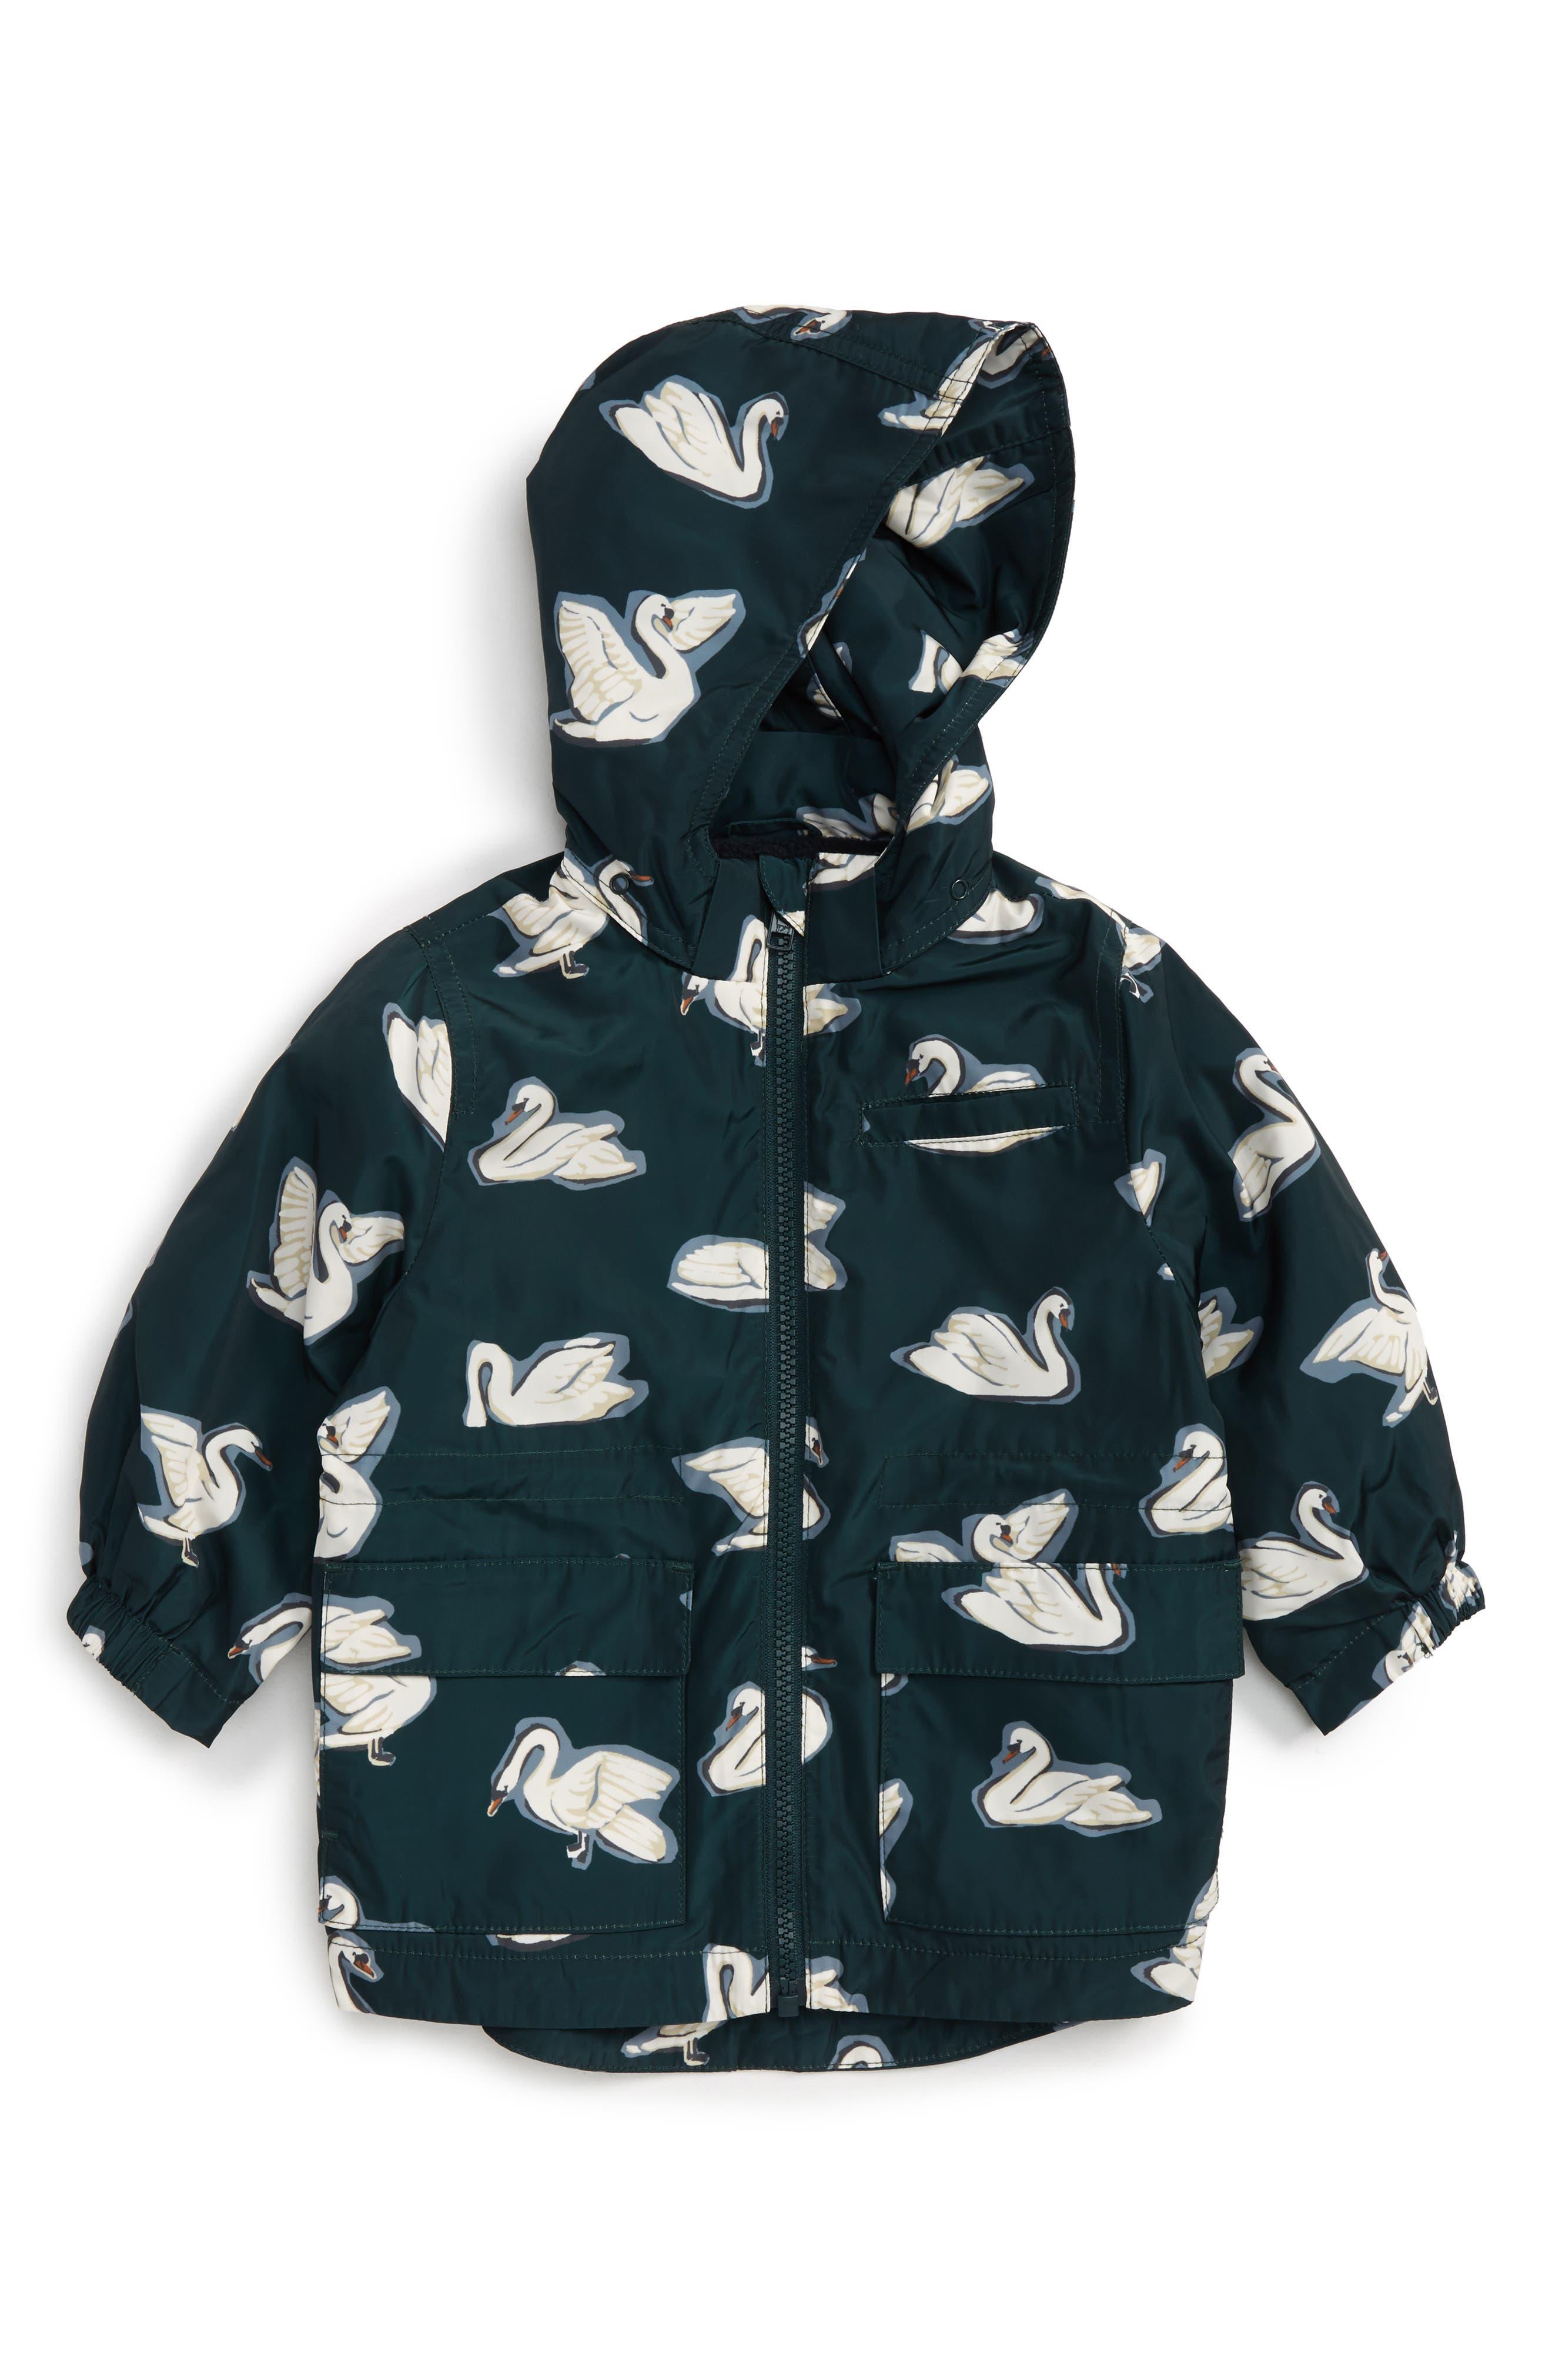 Beck Swan Print Waterproof Jacket with Removable Hood,                             Main thumbnail 1, color,                             460